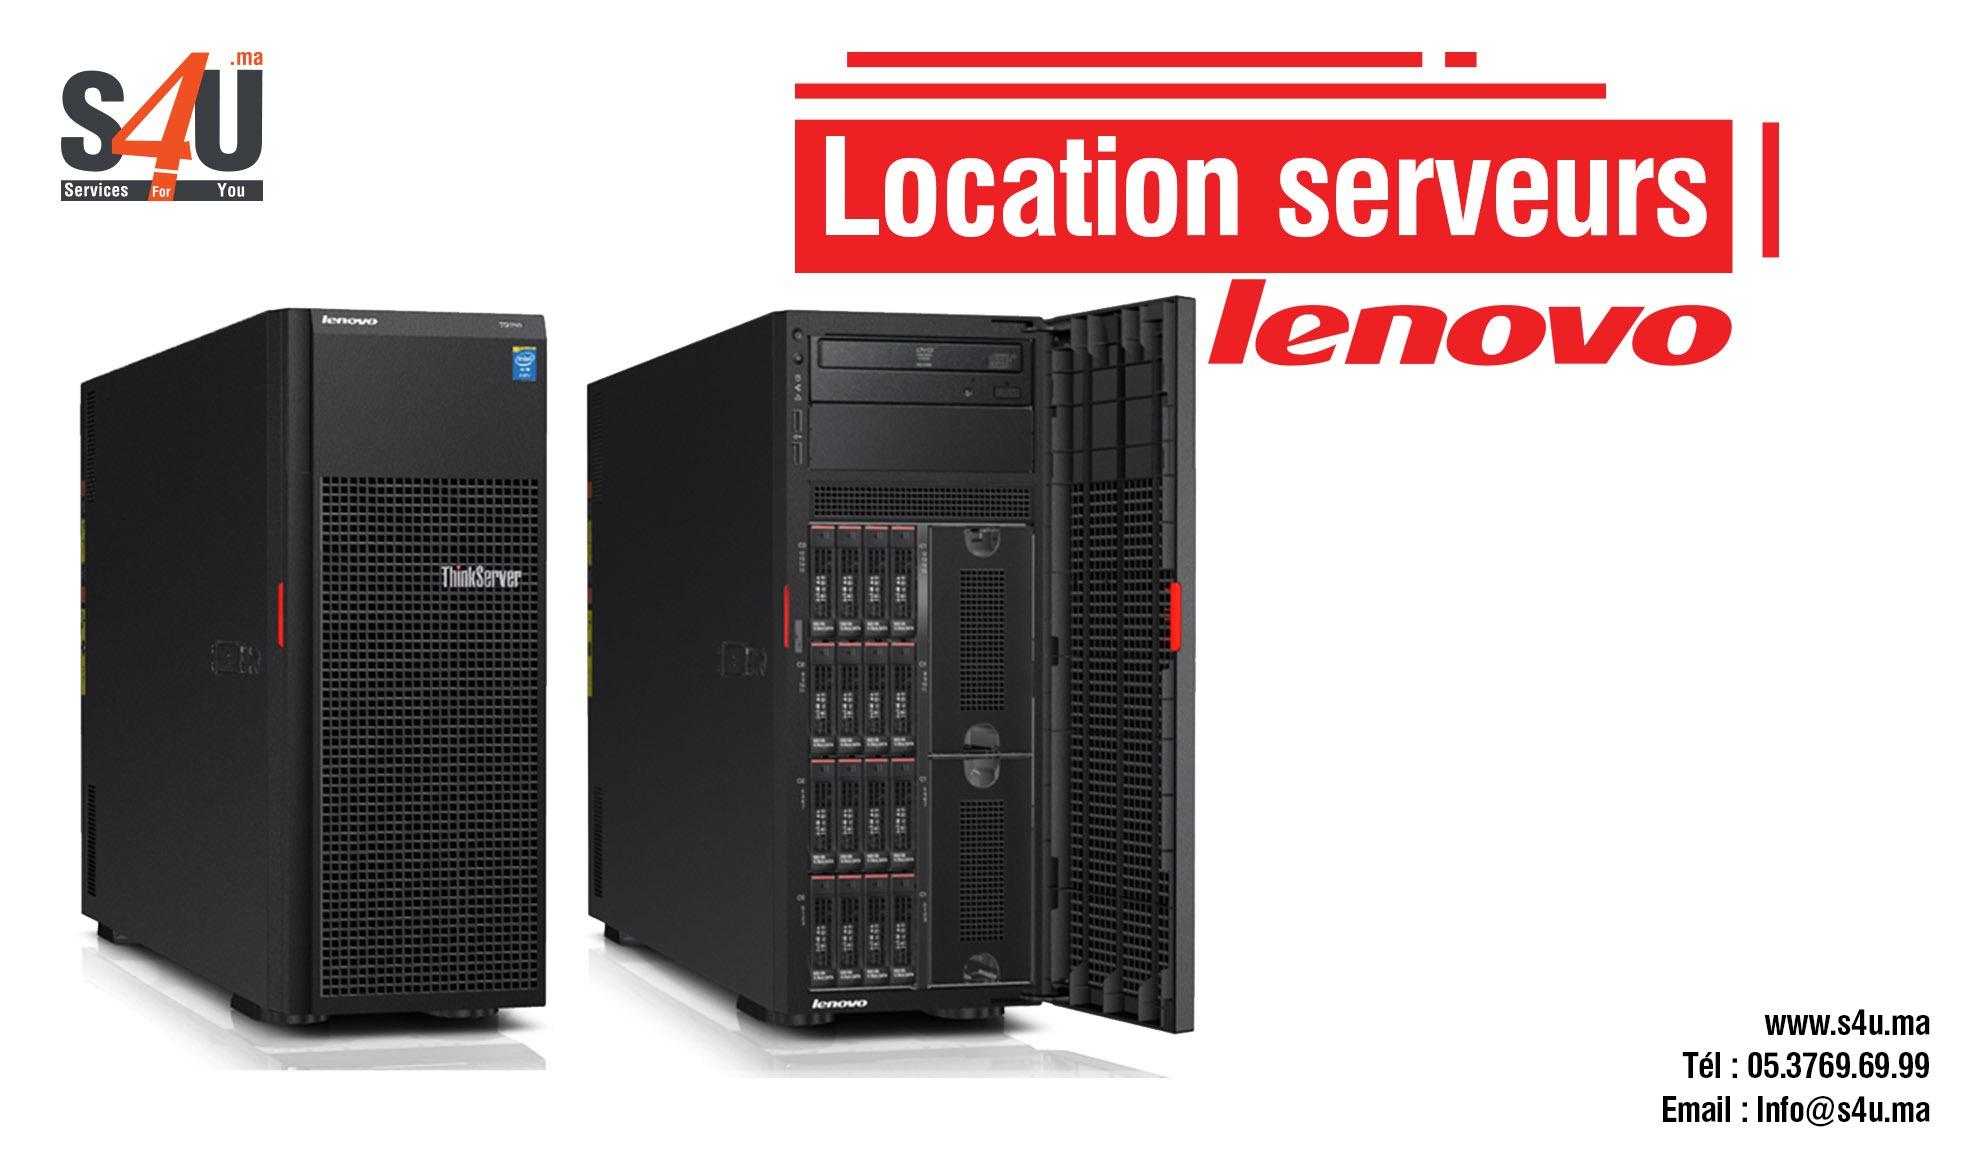 Location des serveurs Lenovo Rabat Casablanca, Maroc